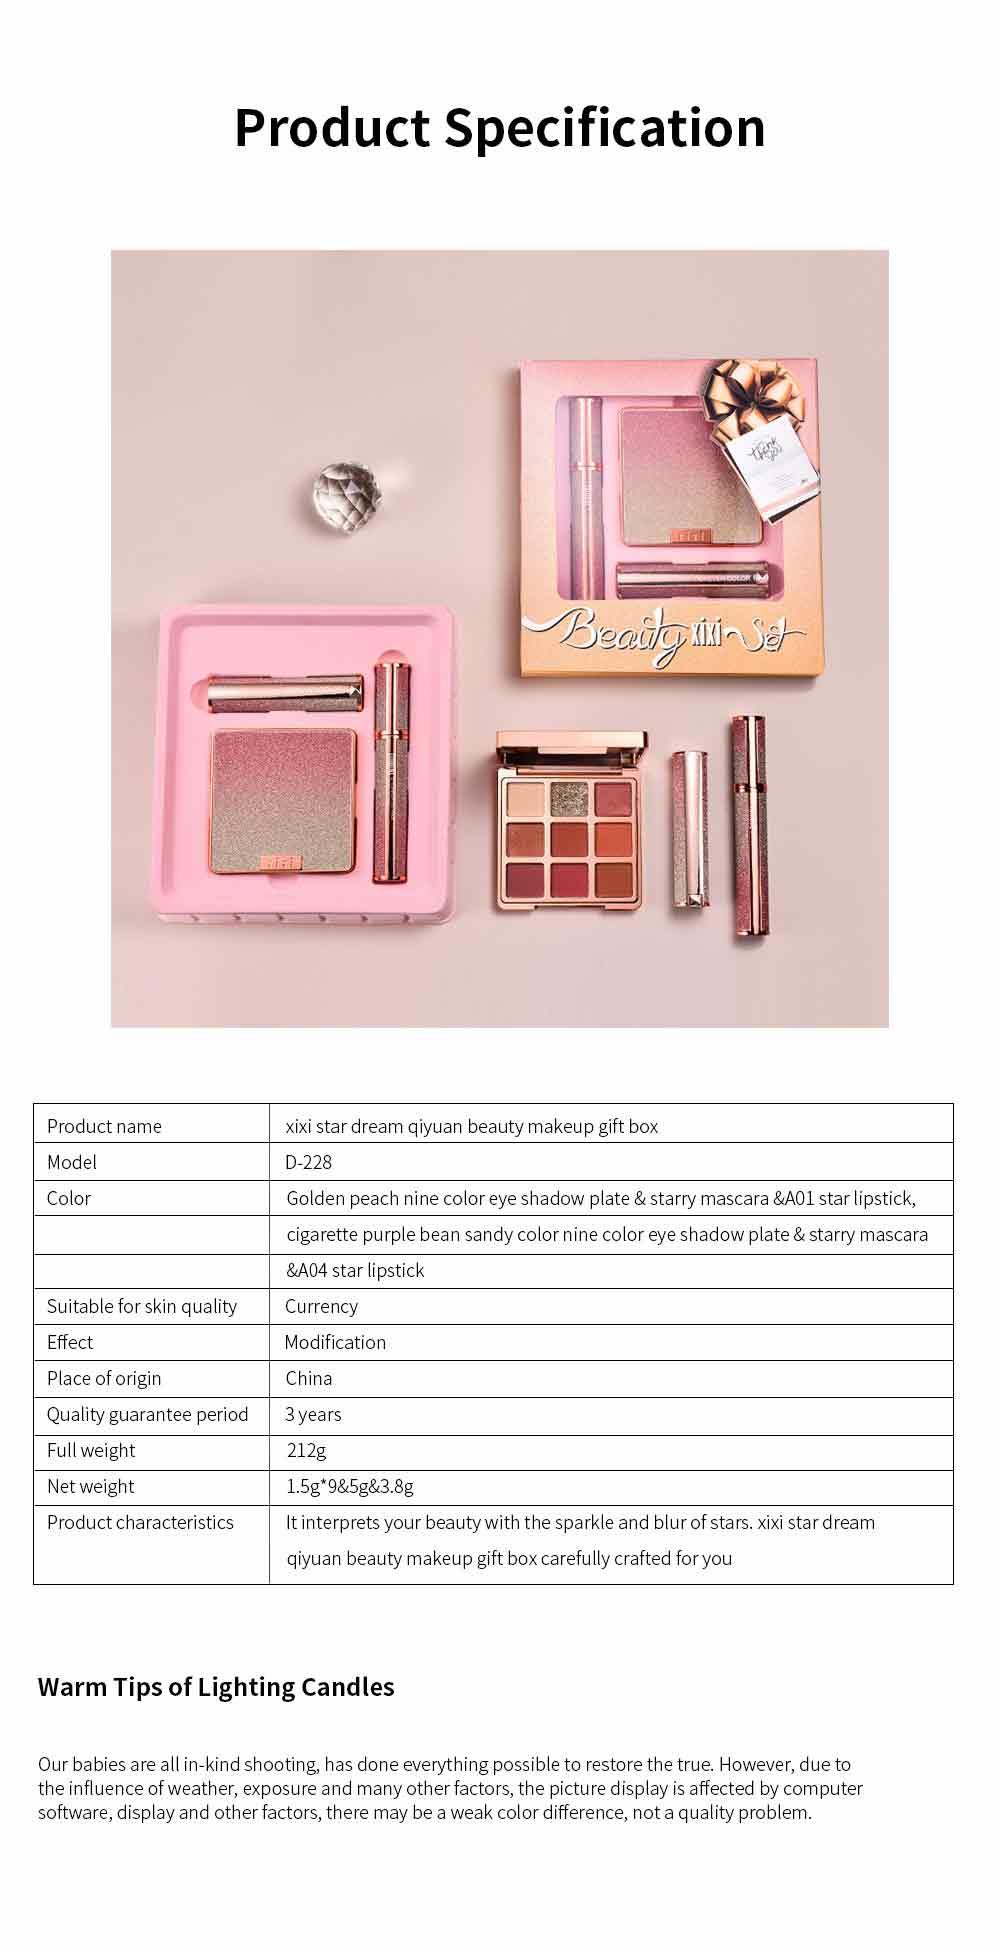 9 Color Eye Shadow & Mascara & Lipstick Set Beauty Makeup Birthday Cosmetic Gift Box Set 8